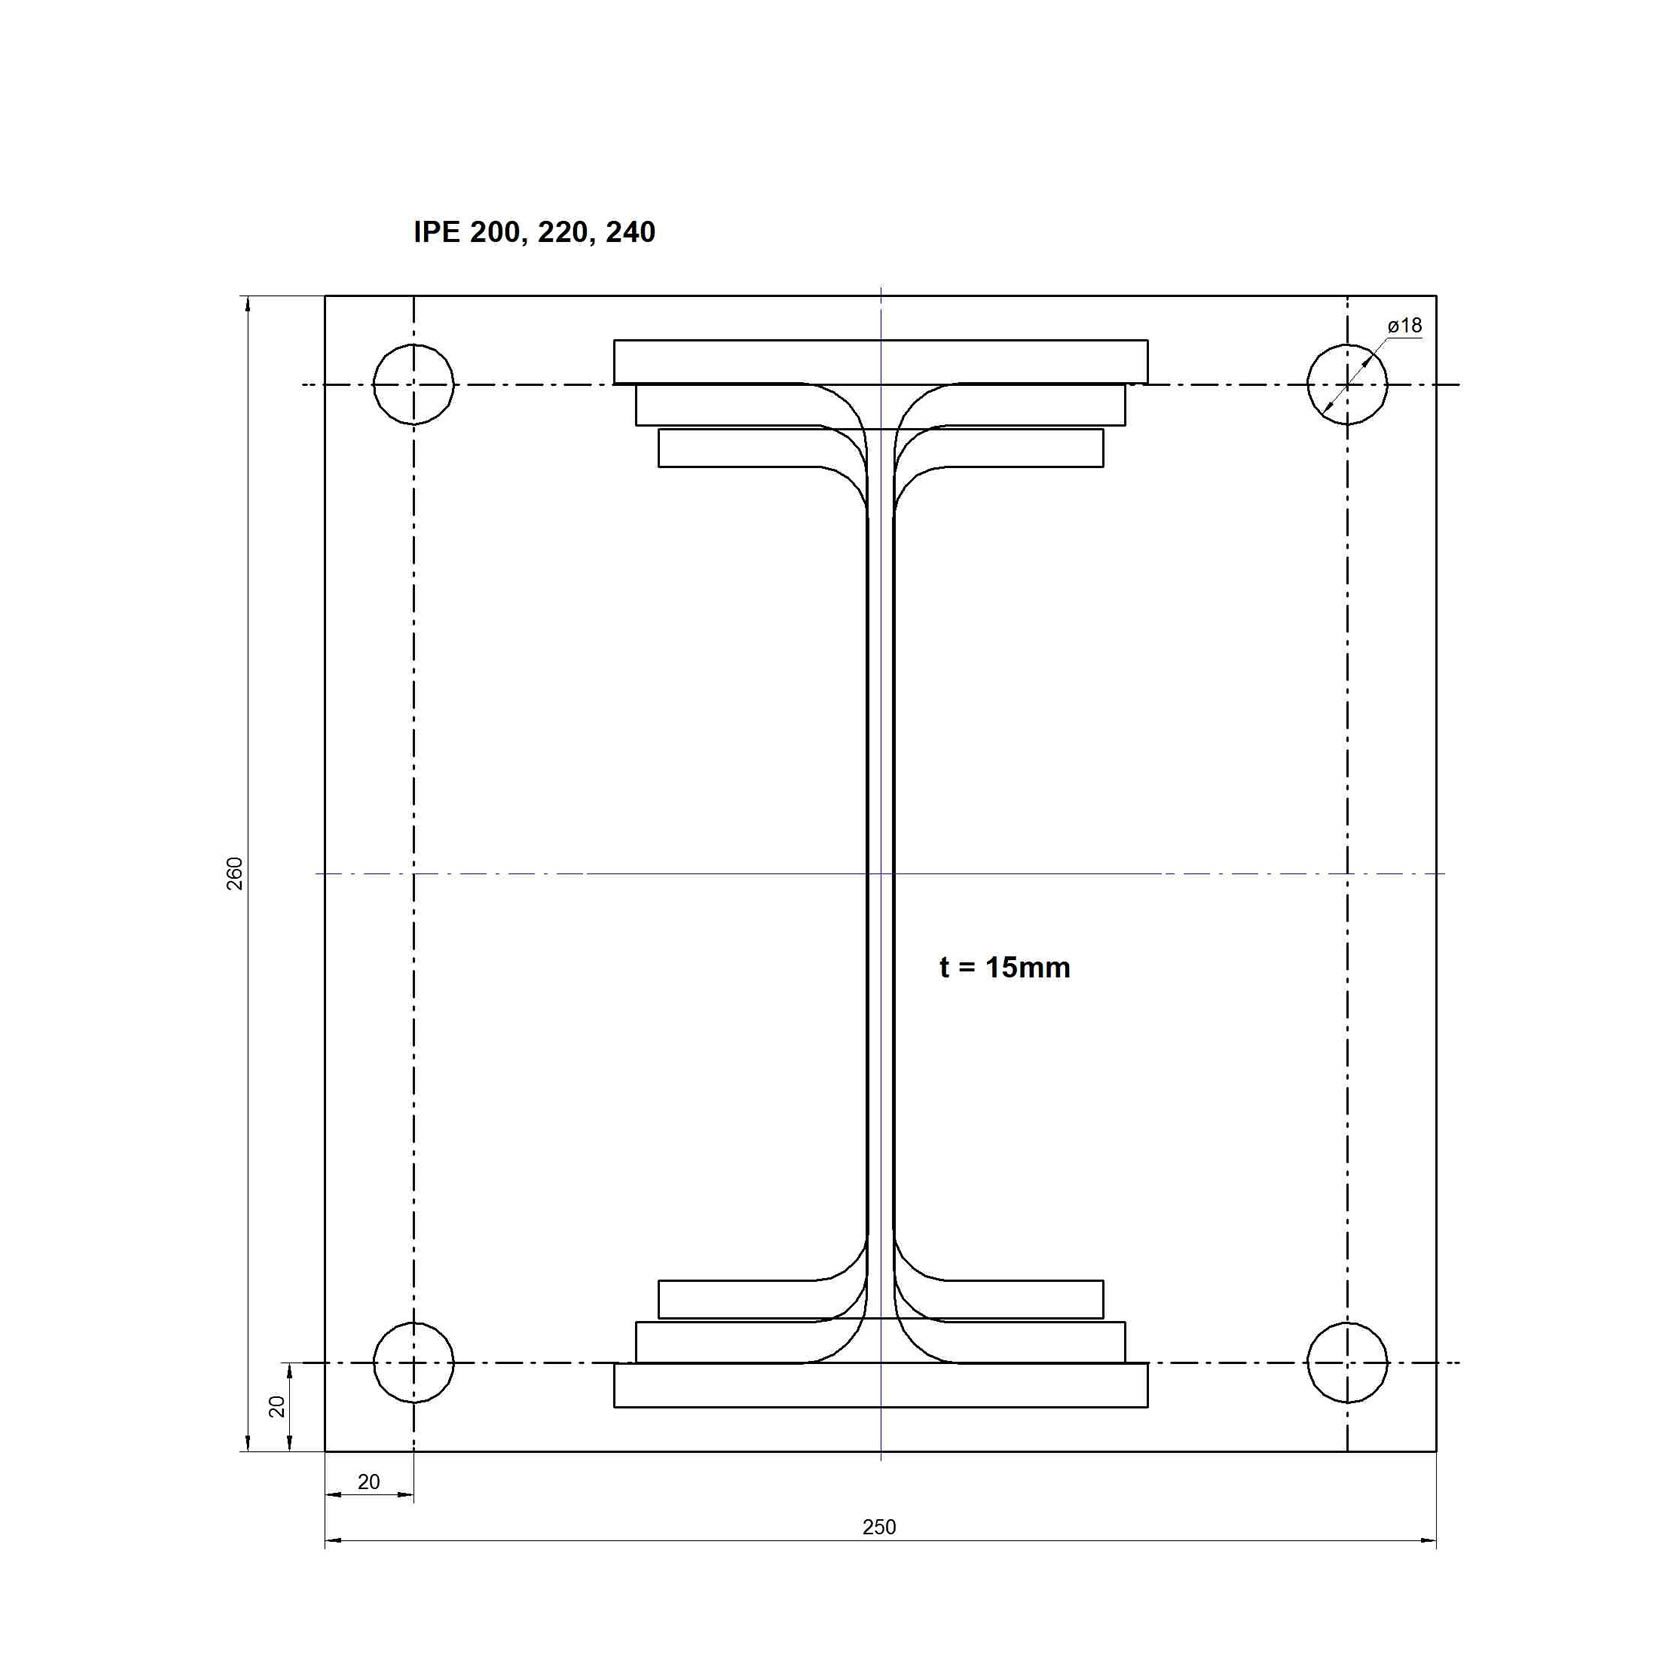 stahltr ger 120 metallschneidemaschine. Black Bedroom Furniture Sets. Home Design Ideas